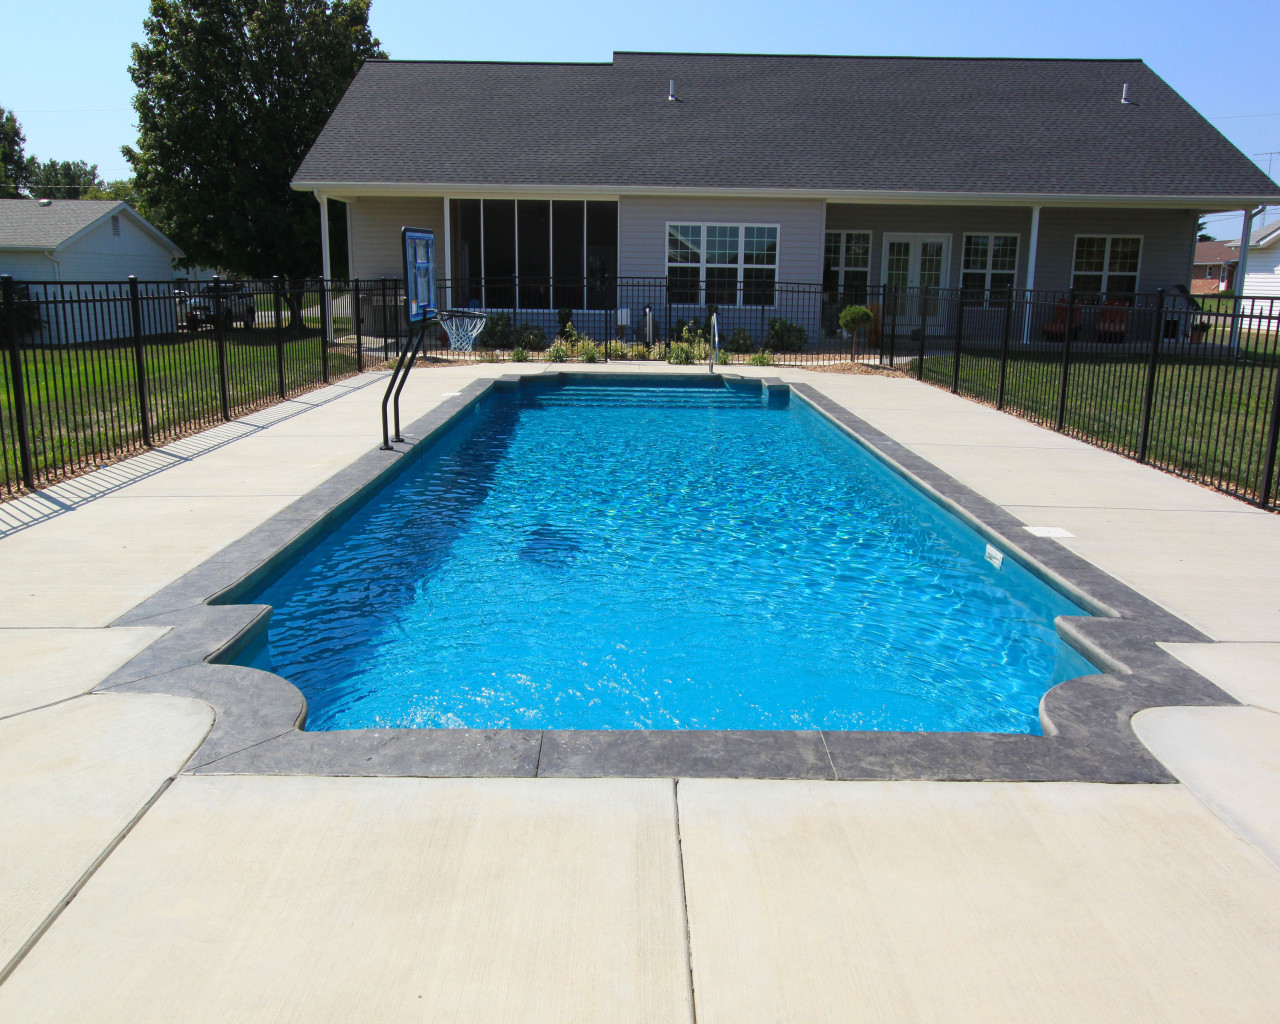 13 - Regulus Pool